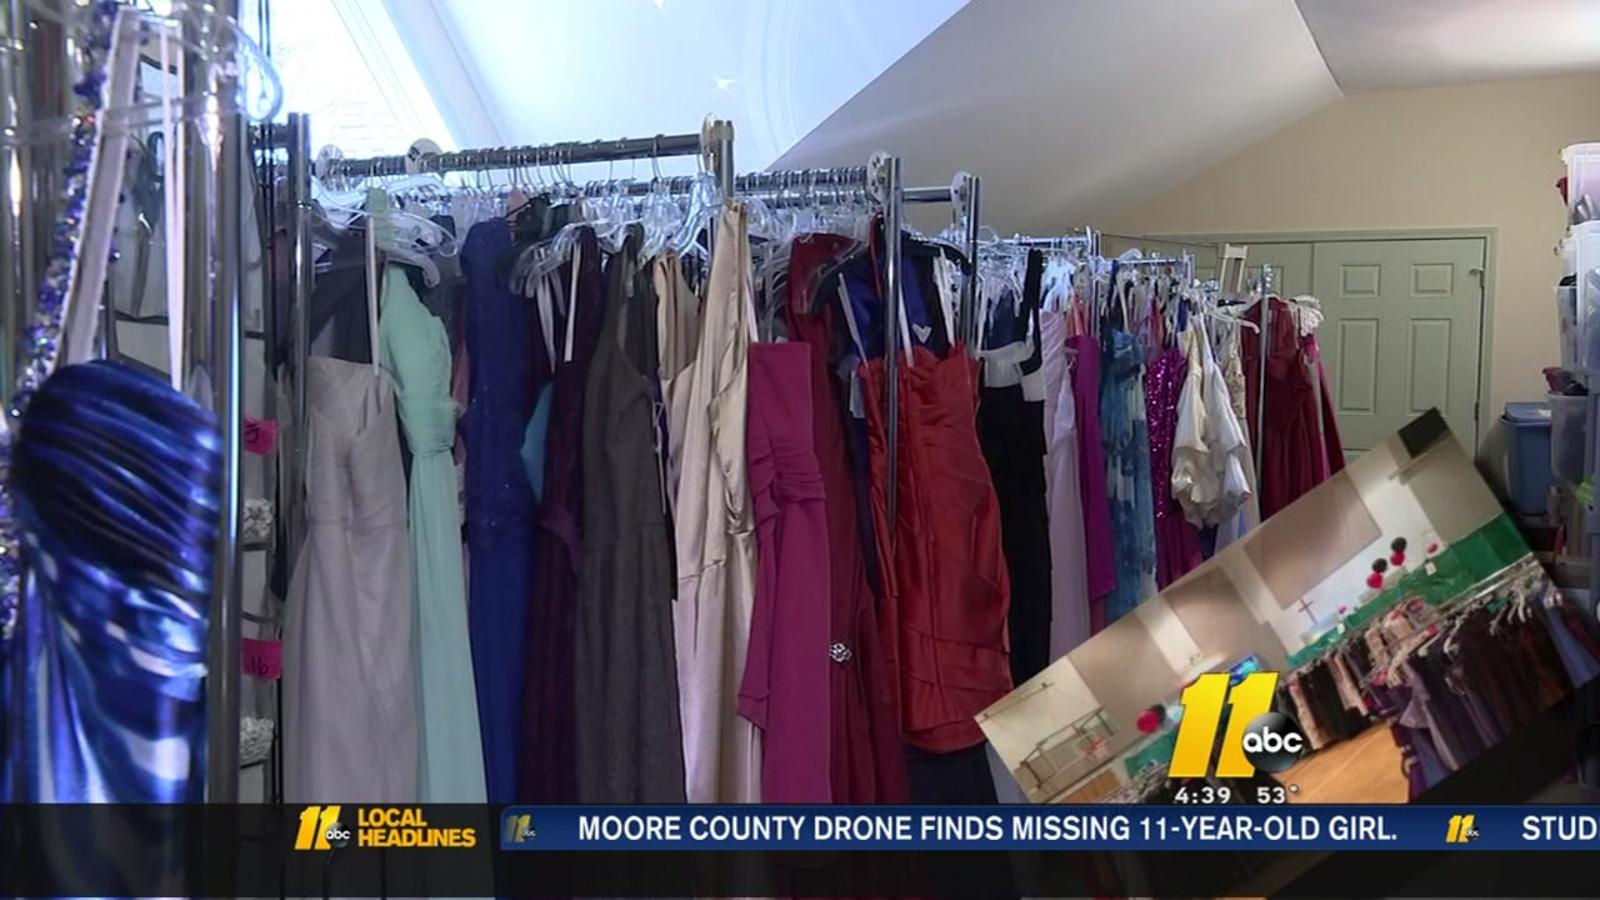 e10bf1261e8 Apex United Methodist Church hosts Prom Shoppe with free dresses ...